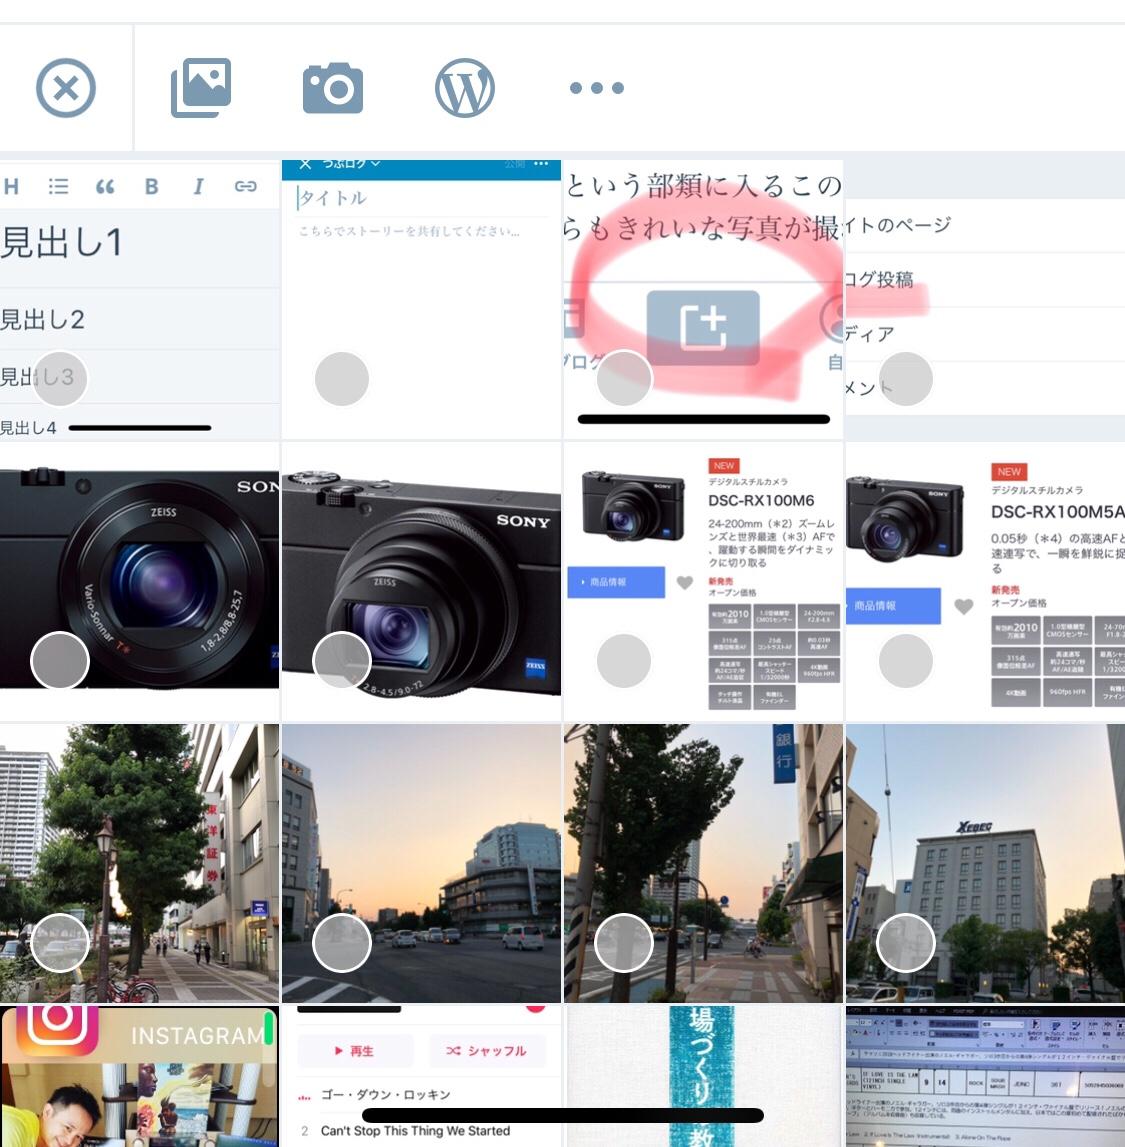 WordPressアプリで画像を追加する